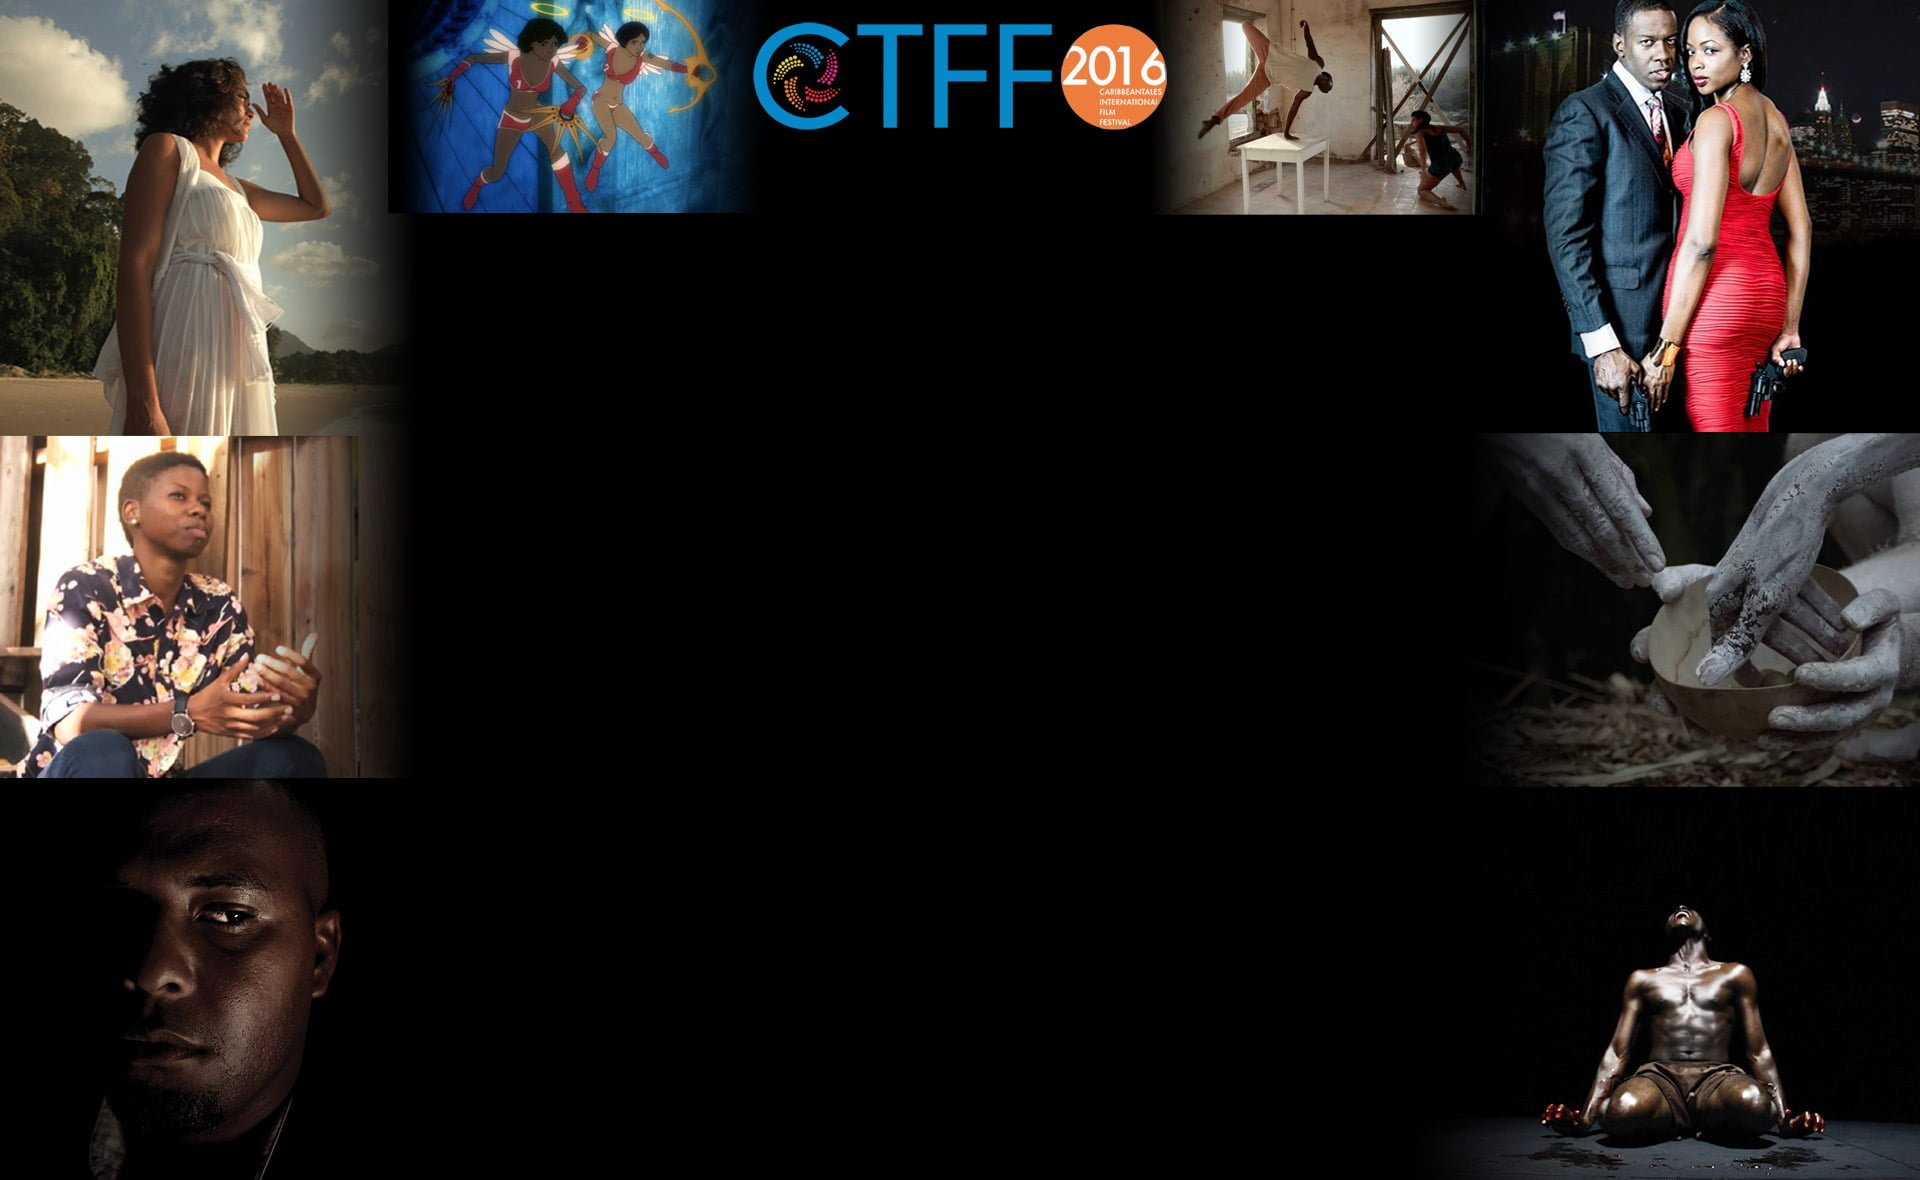 CTFF 2016 - background